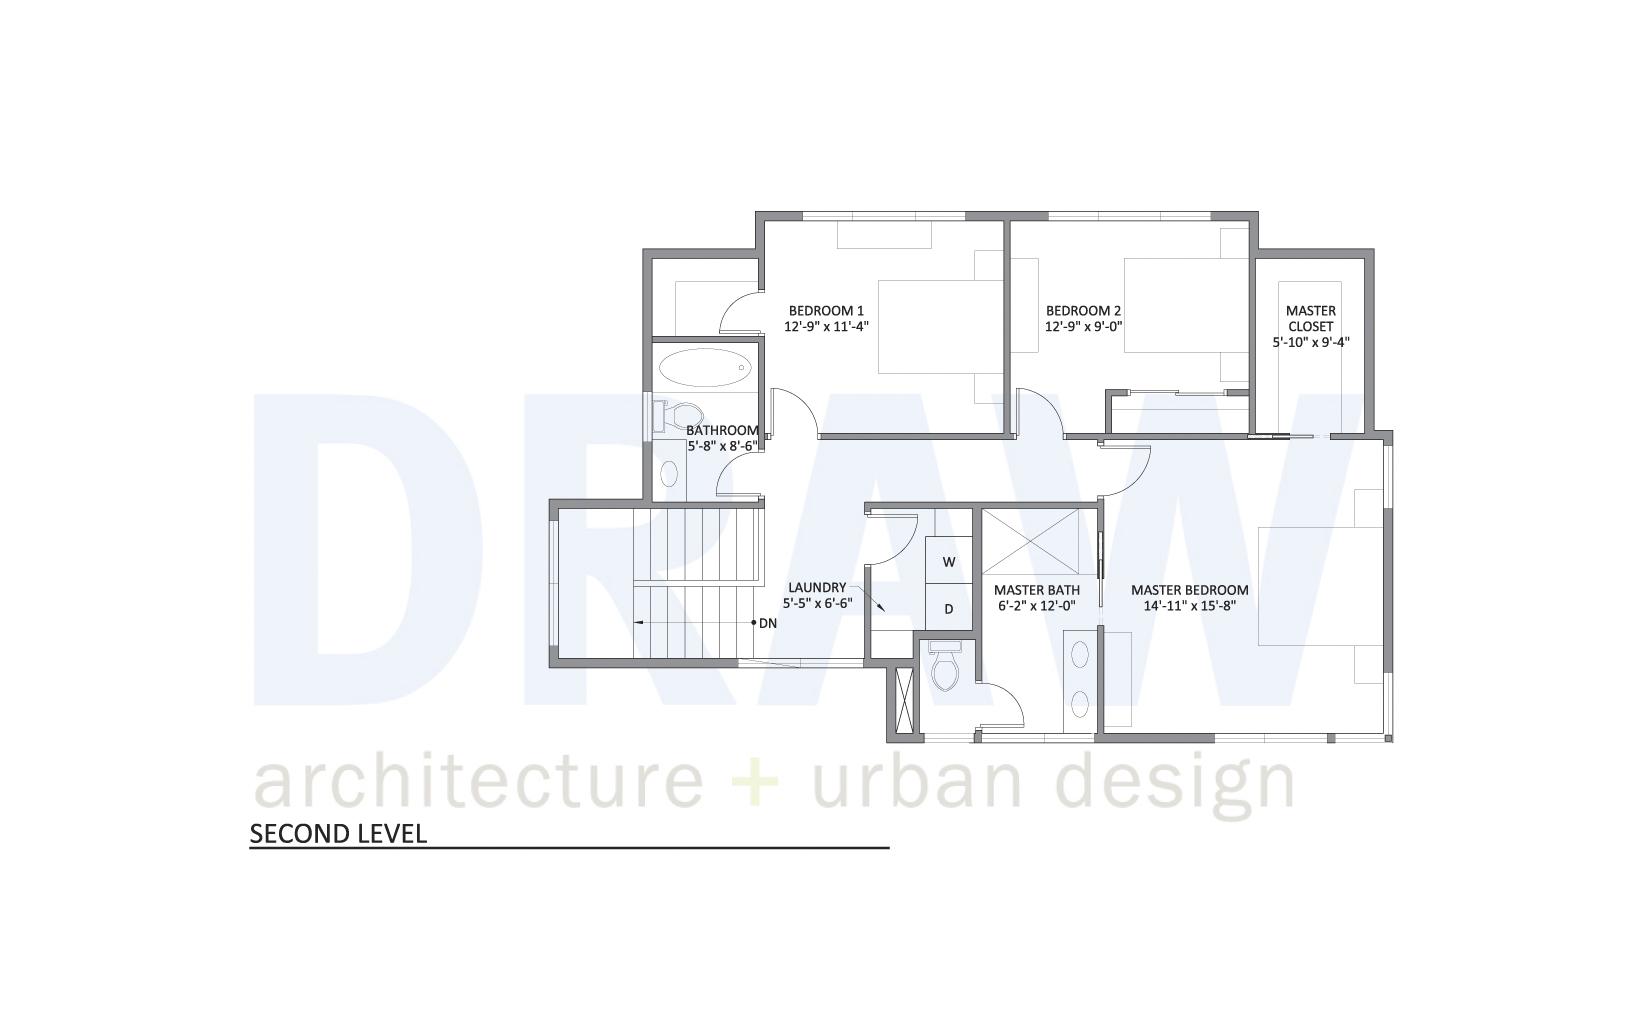 House plan 2 second level floor plans for Floor plans kansas city